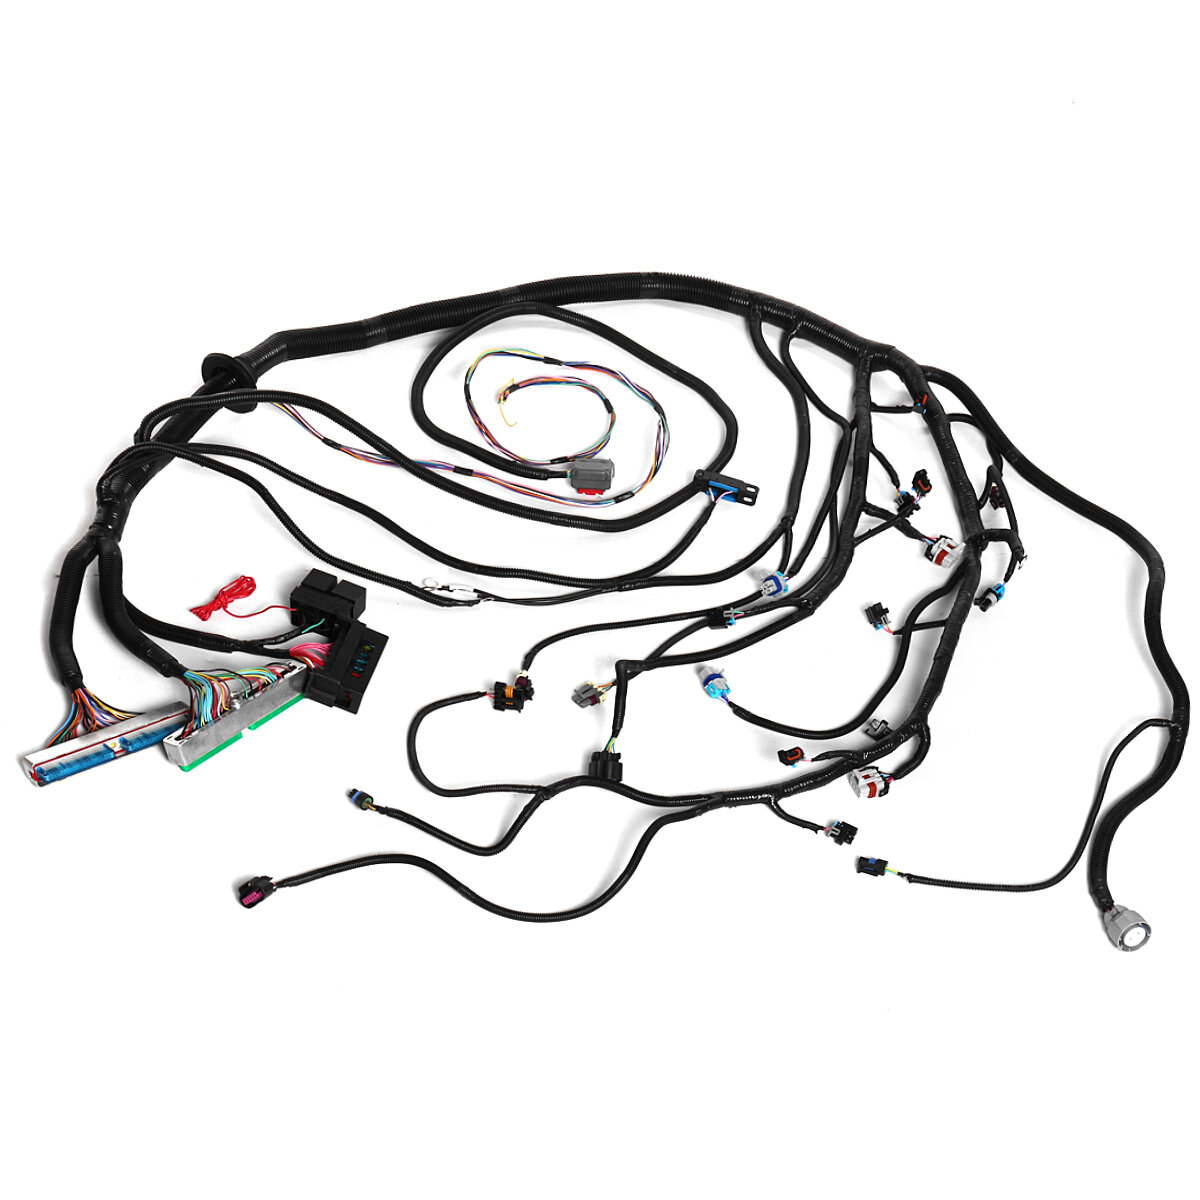 03 07 Ls Vortec Standalone Wiring Harness Drivebywire W